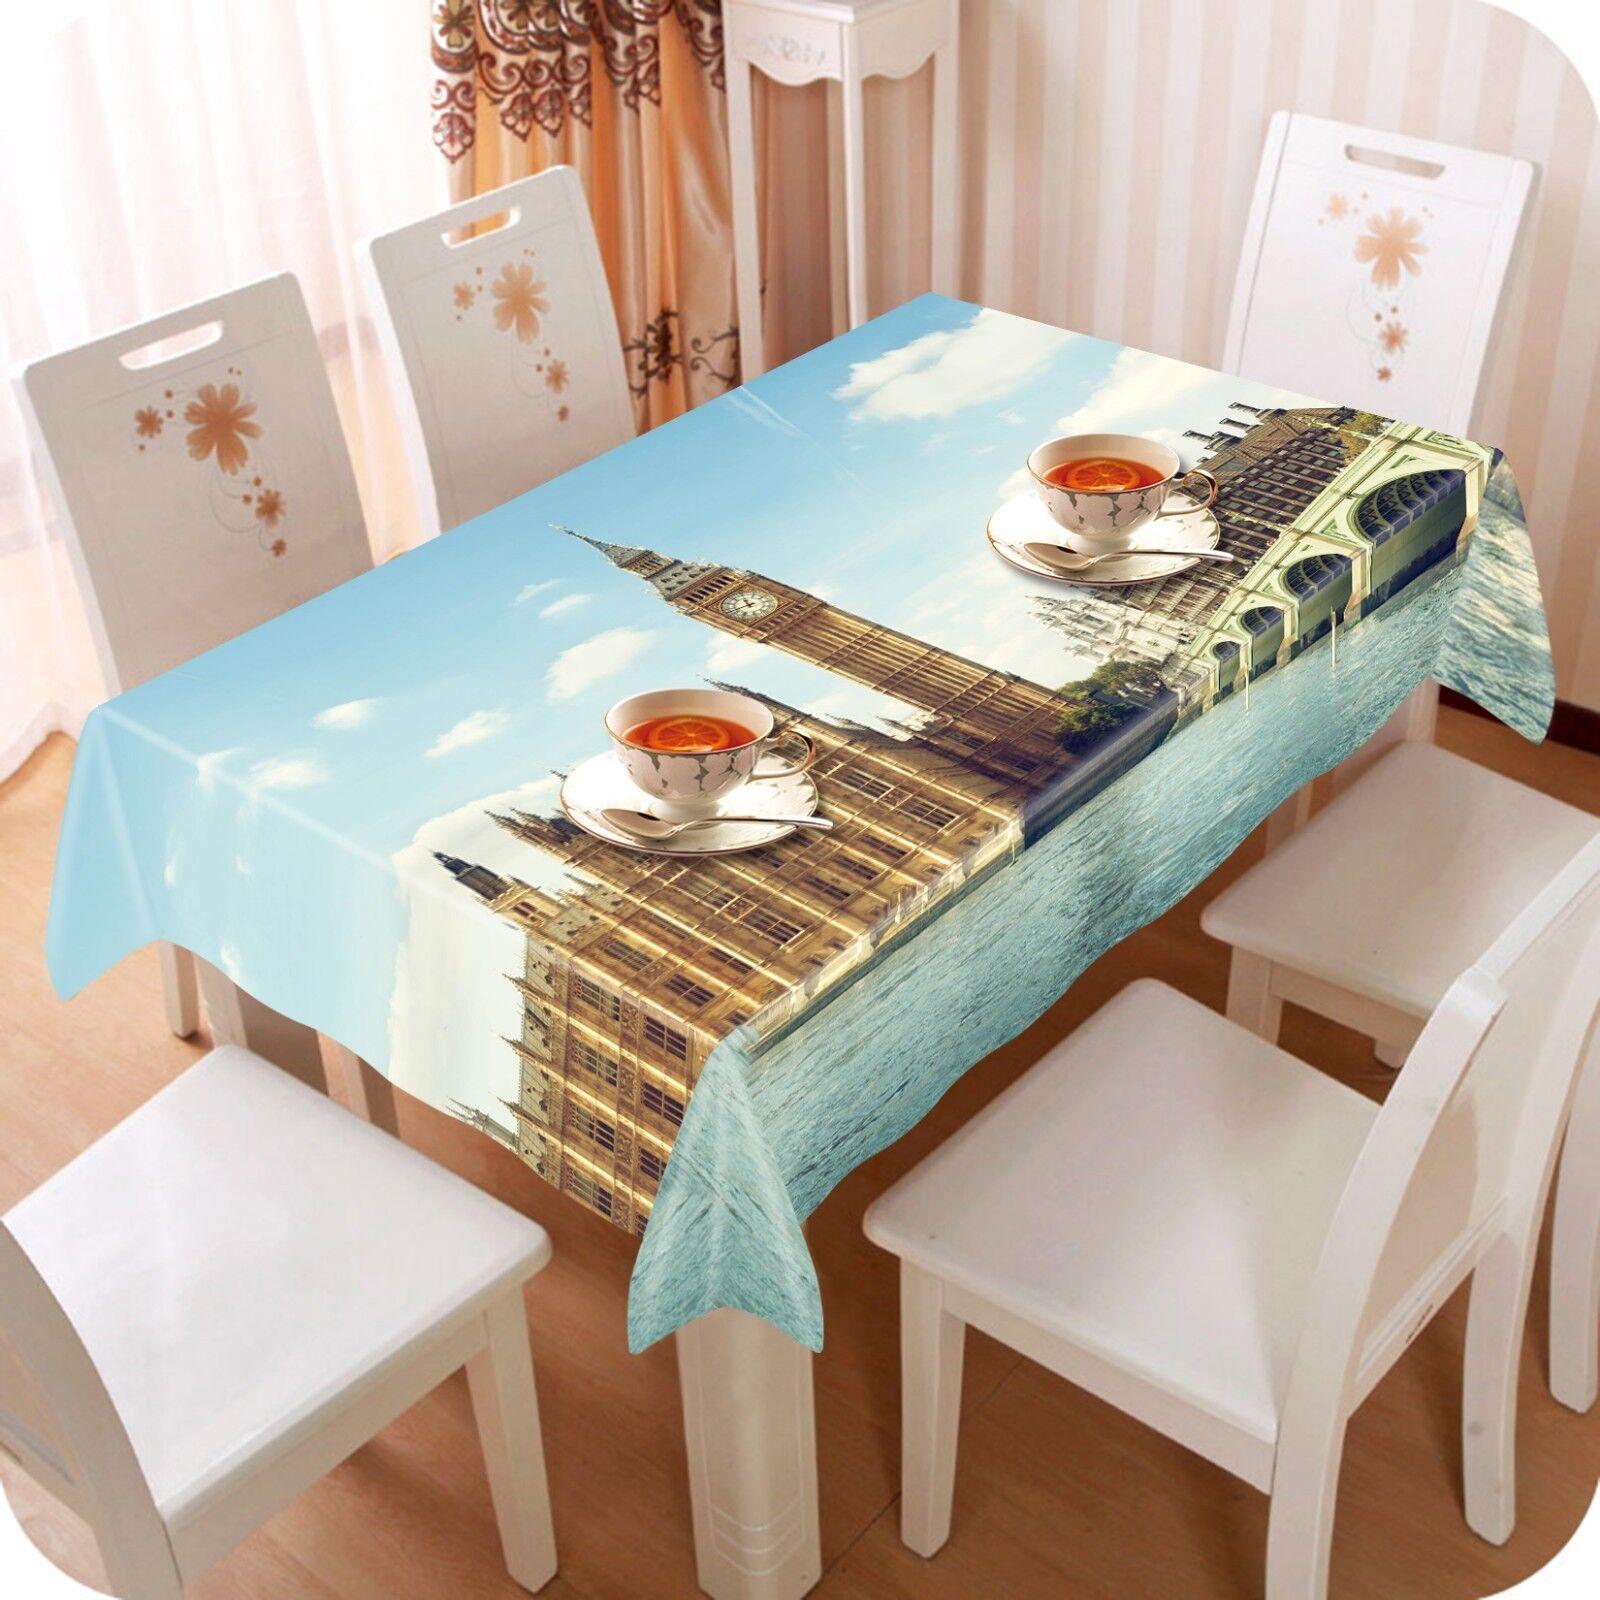 3D Paris City 055 Tablecloth Table Table Table Cover Cloth Birthday Party Event AJ Lemon f21993